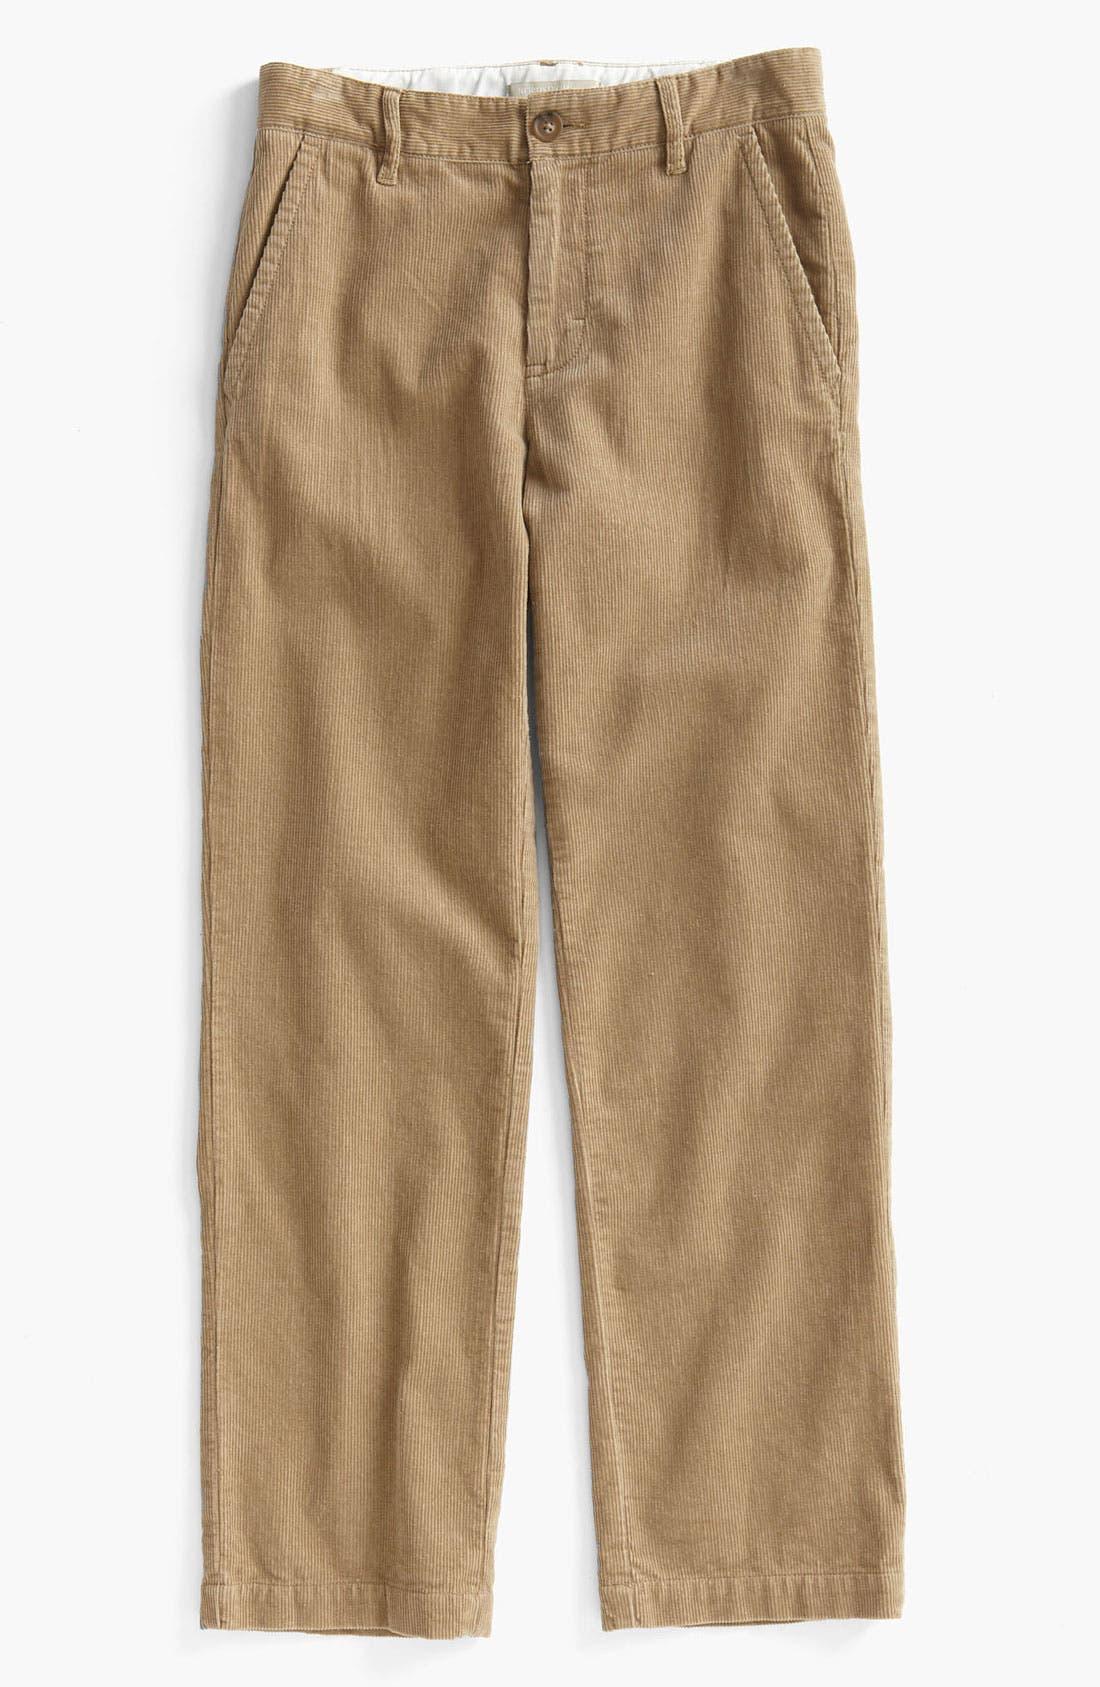 Alternate Image 1 Selected - Nordstrom 'Edward' Corduroy Trousers (Little Boys)